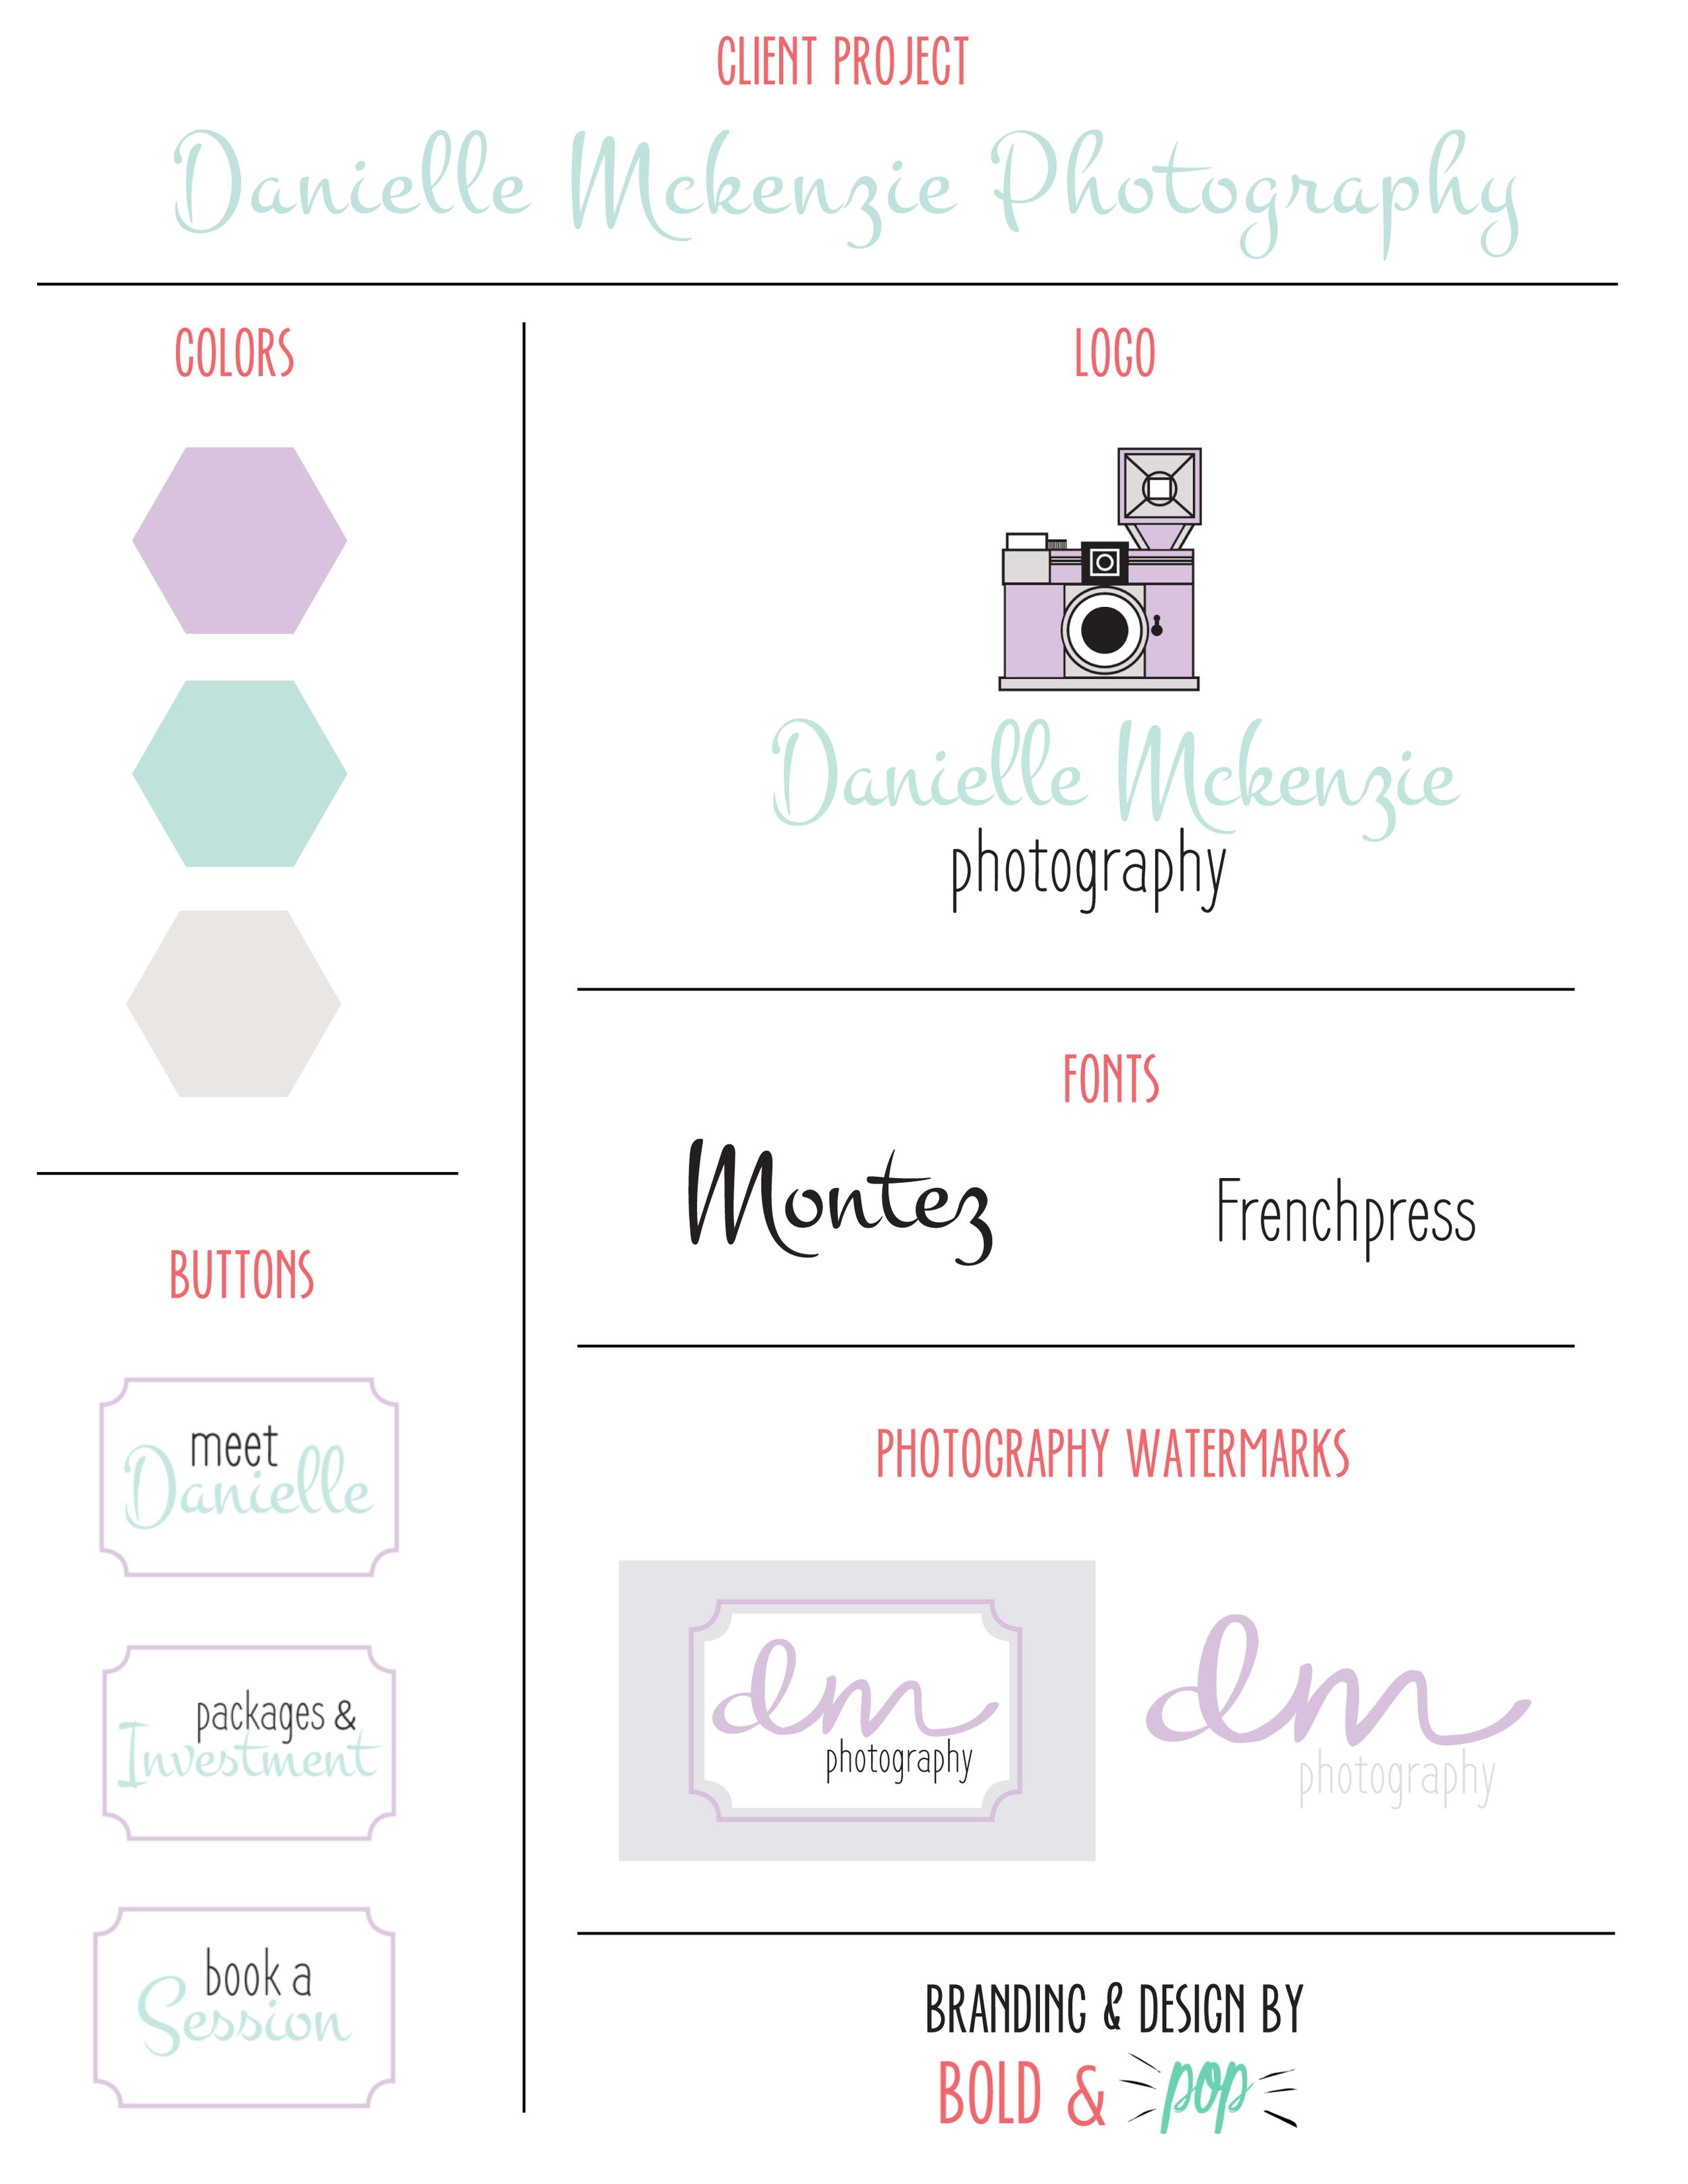 Bold & Pop : Danielle Mckenzie Photography Branding & Website Design